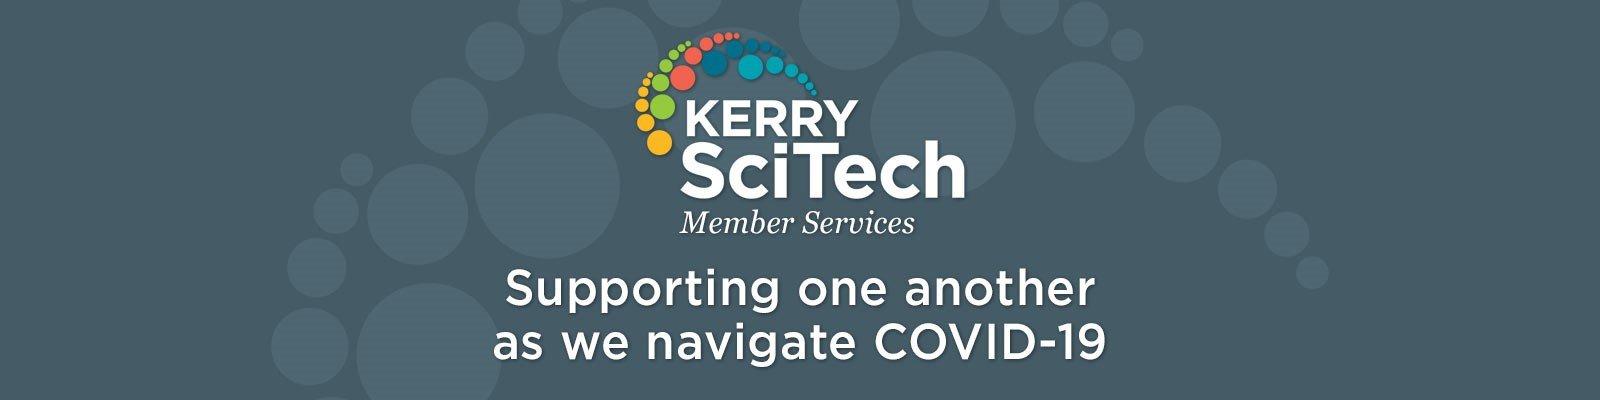 KerrySciTech Covid